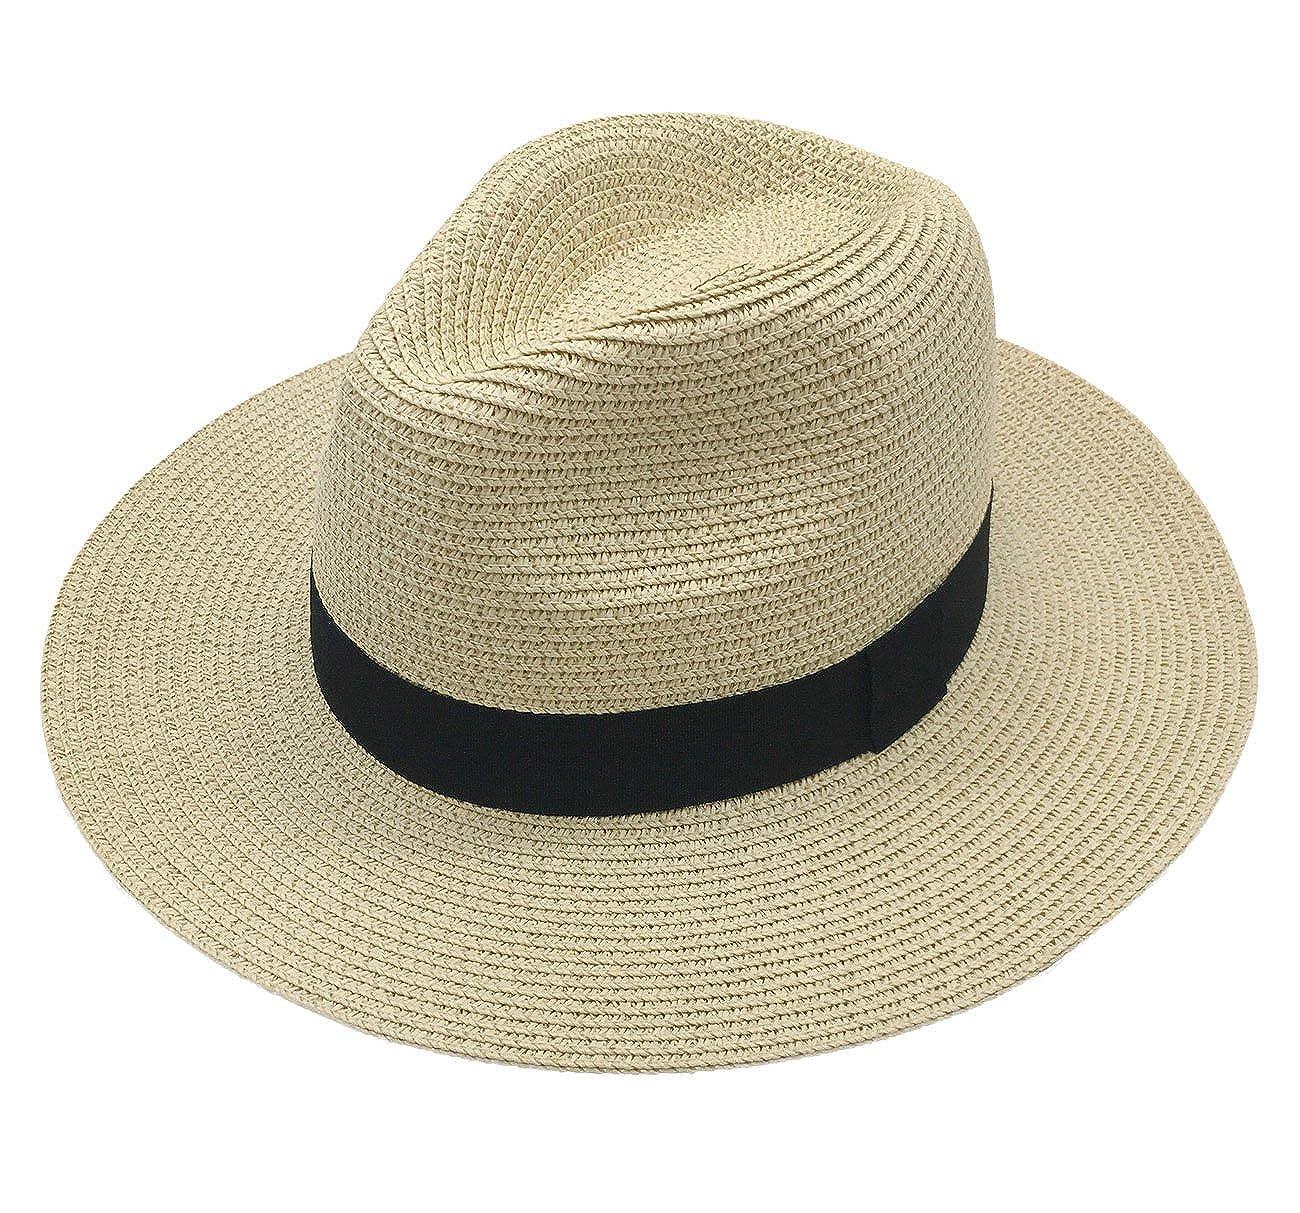 9dba6d3b Online Cheap wholesale Straw Fedora Panama Hat Packable Fashion Summer Sun  Hats Women Beach Wide Brim Sun Hats Suppliers